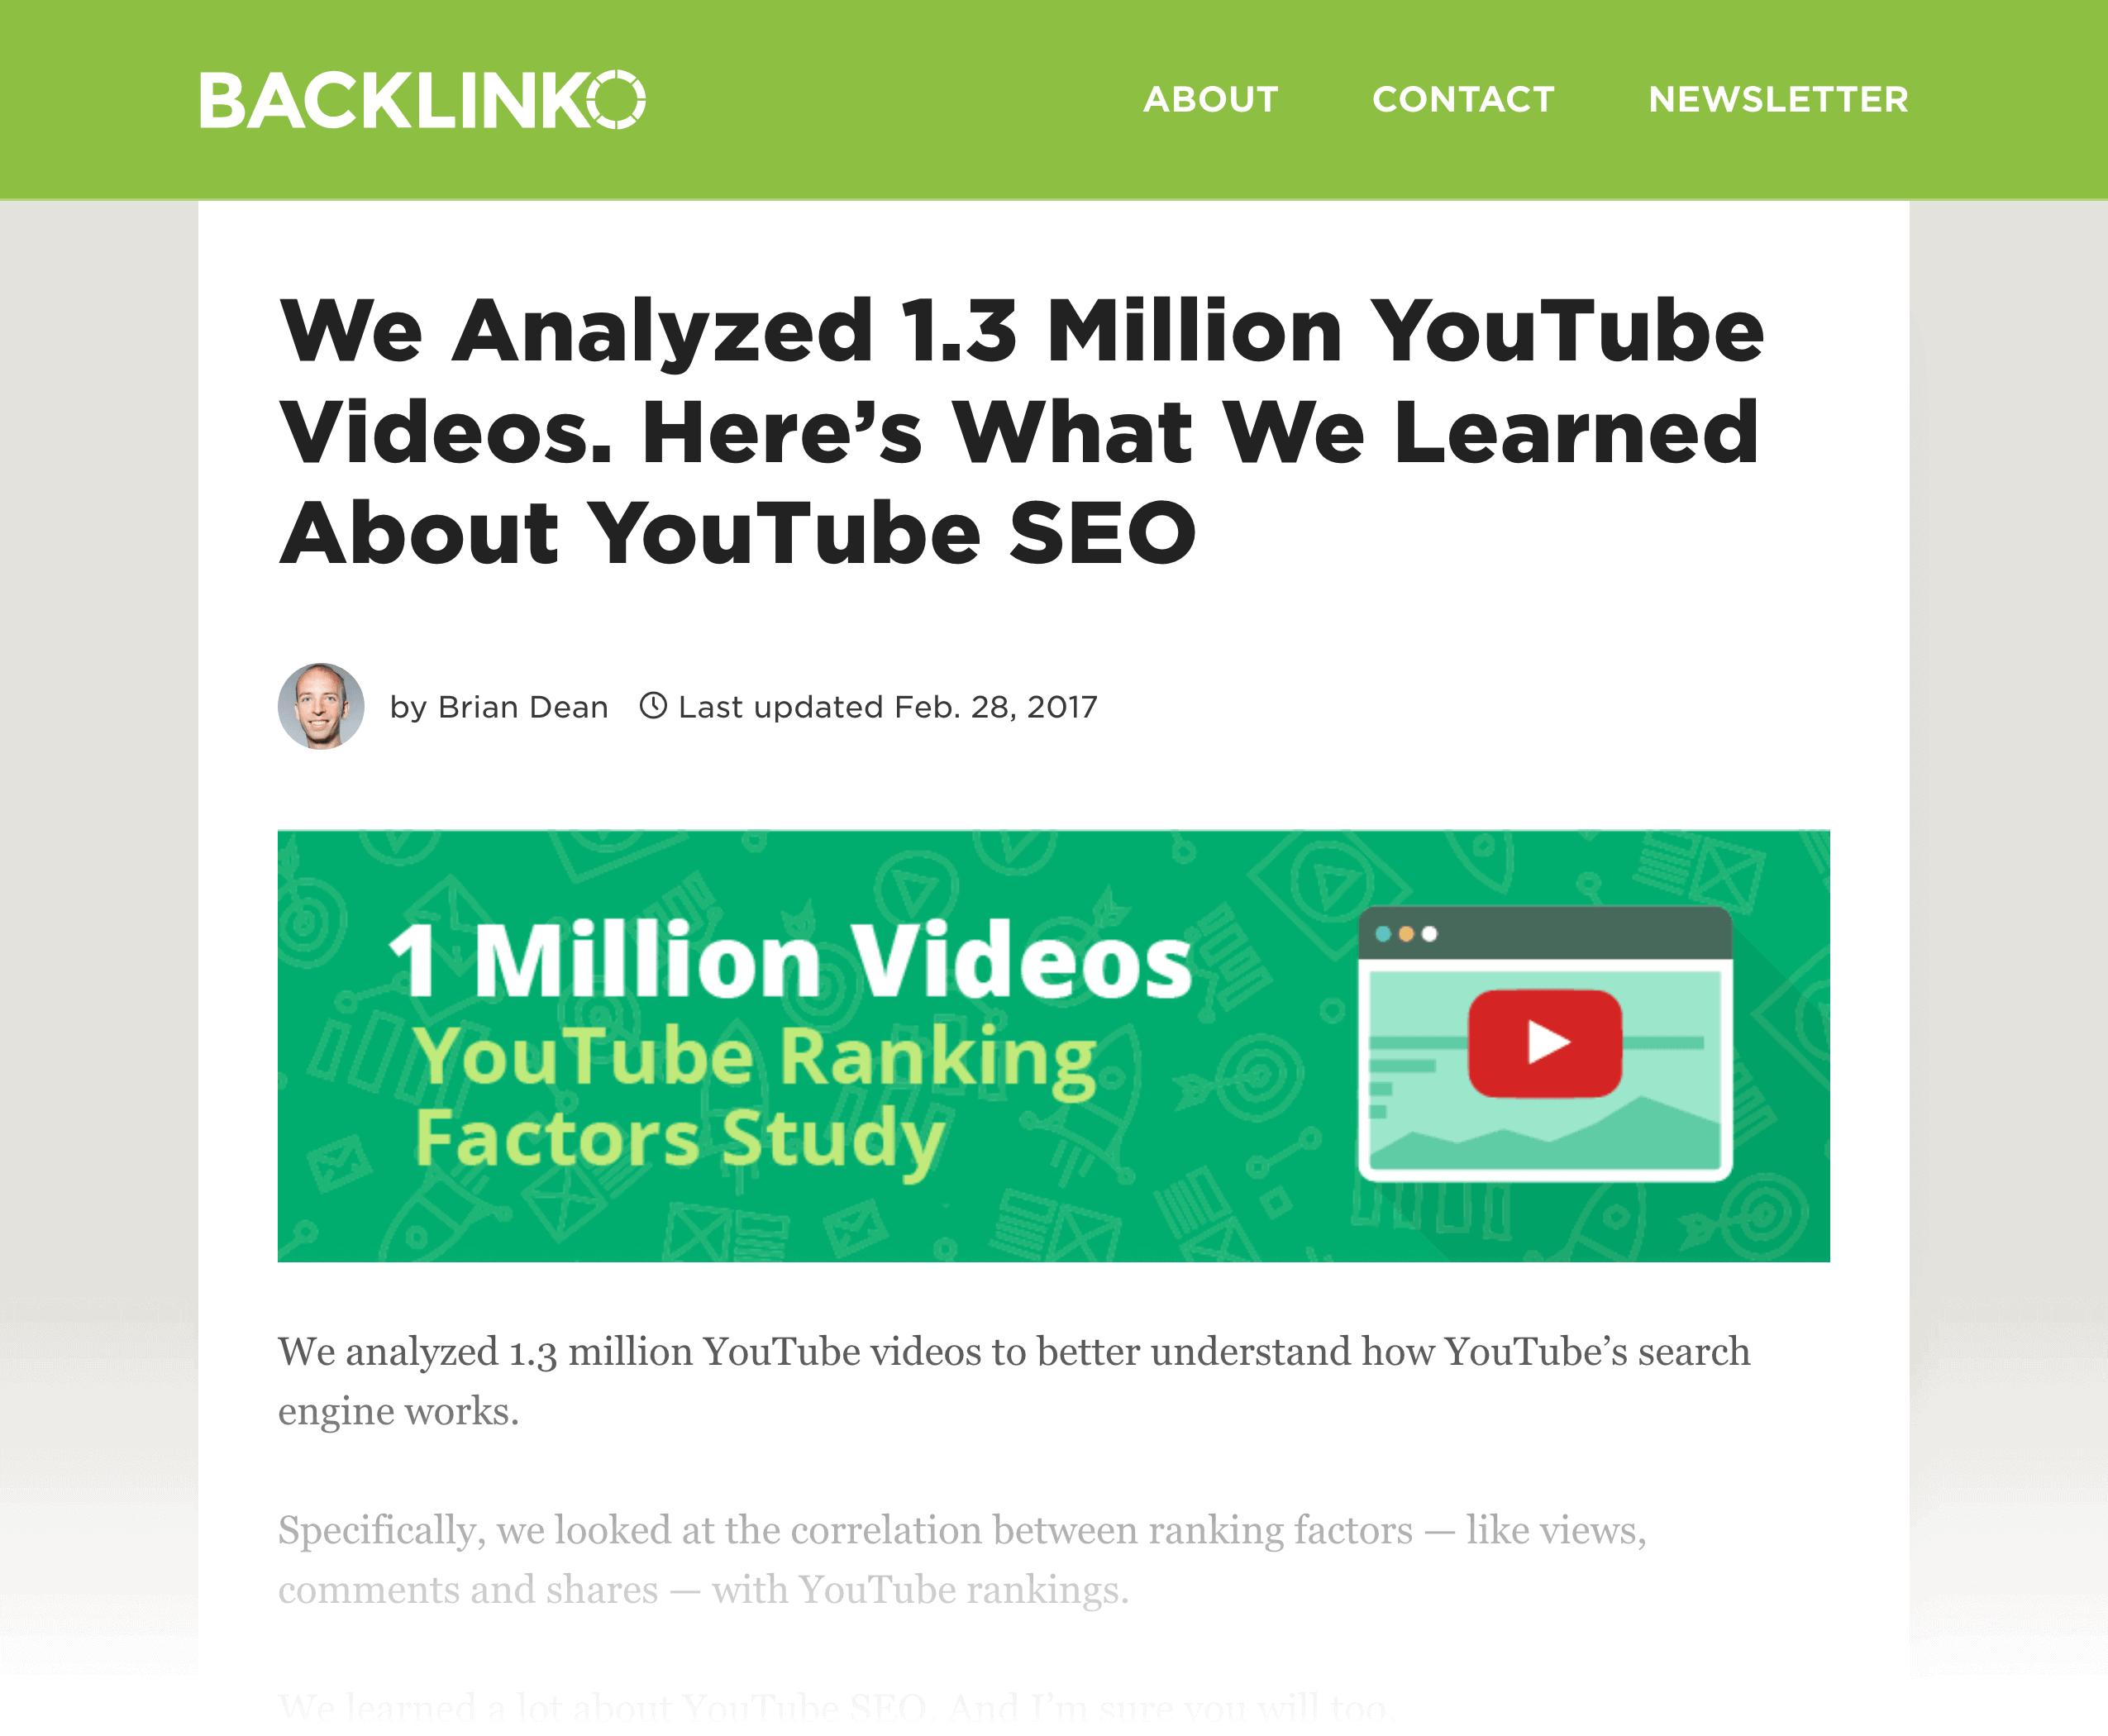 YouTube Ranking Factors study